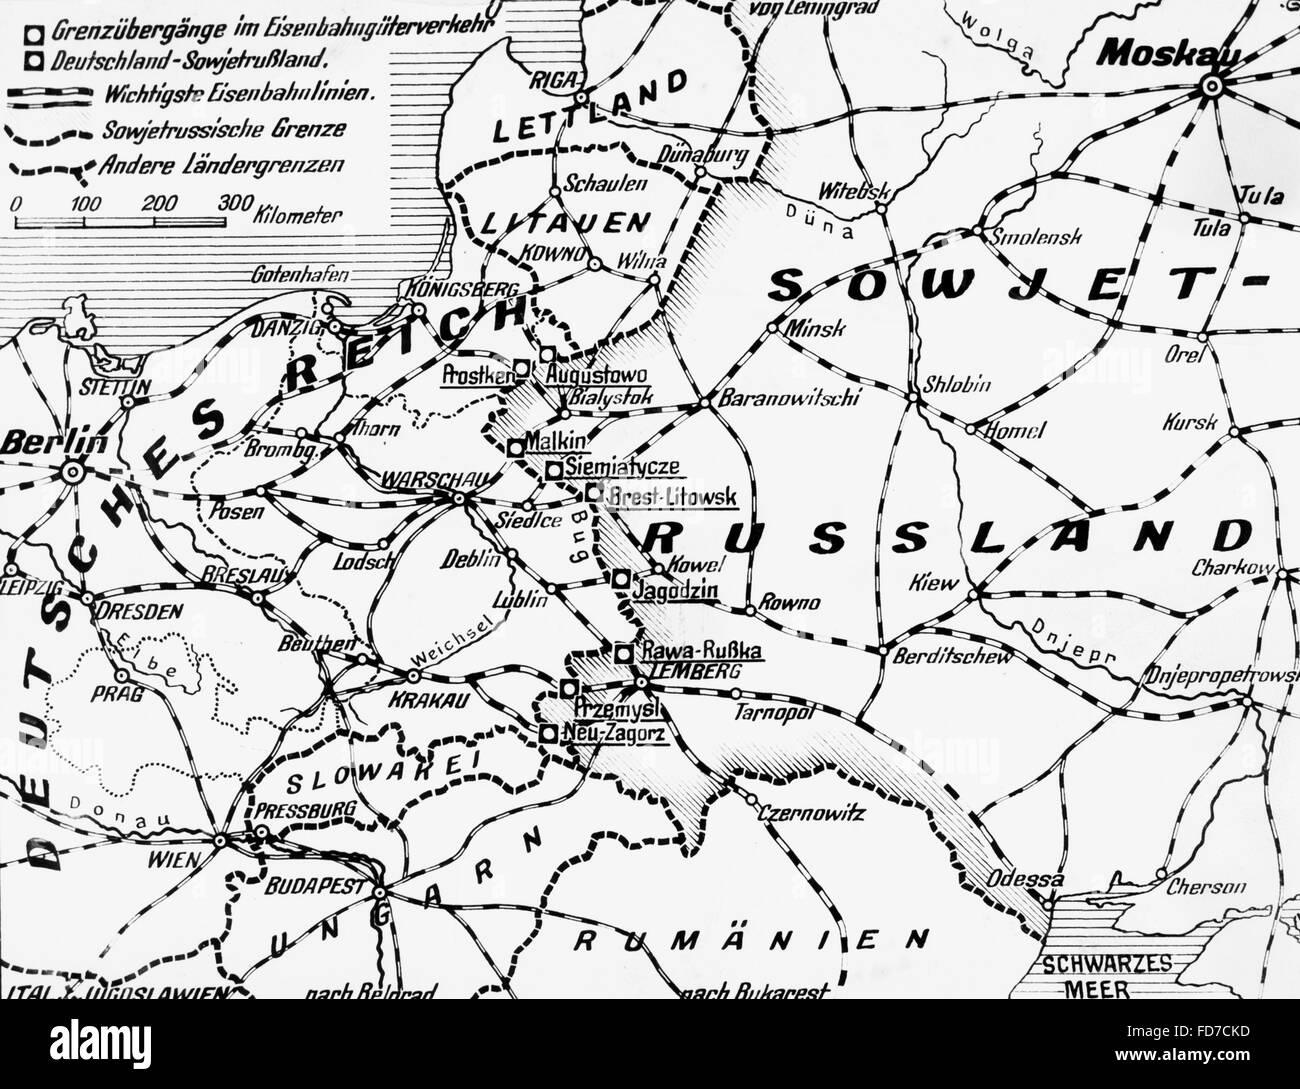 Map of Eastern Europe GermanSoviet border 1940 Stock Photo